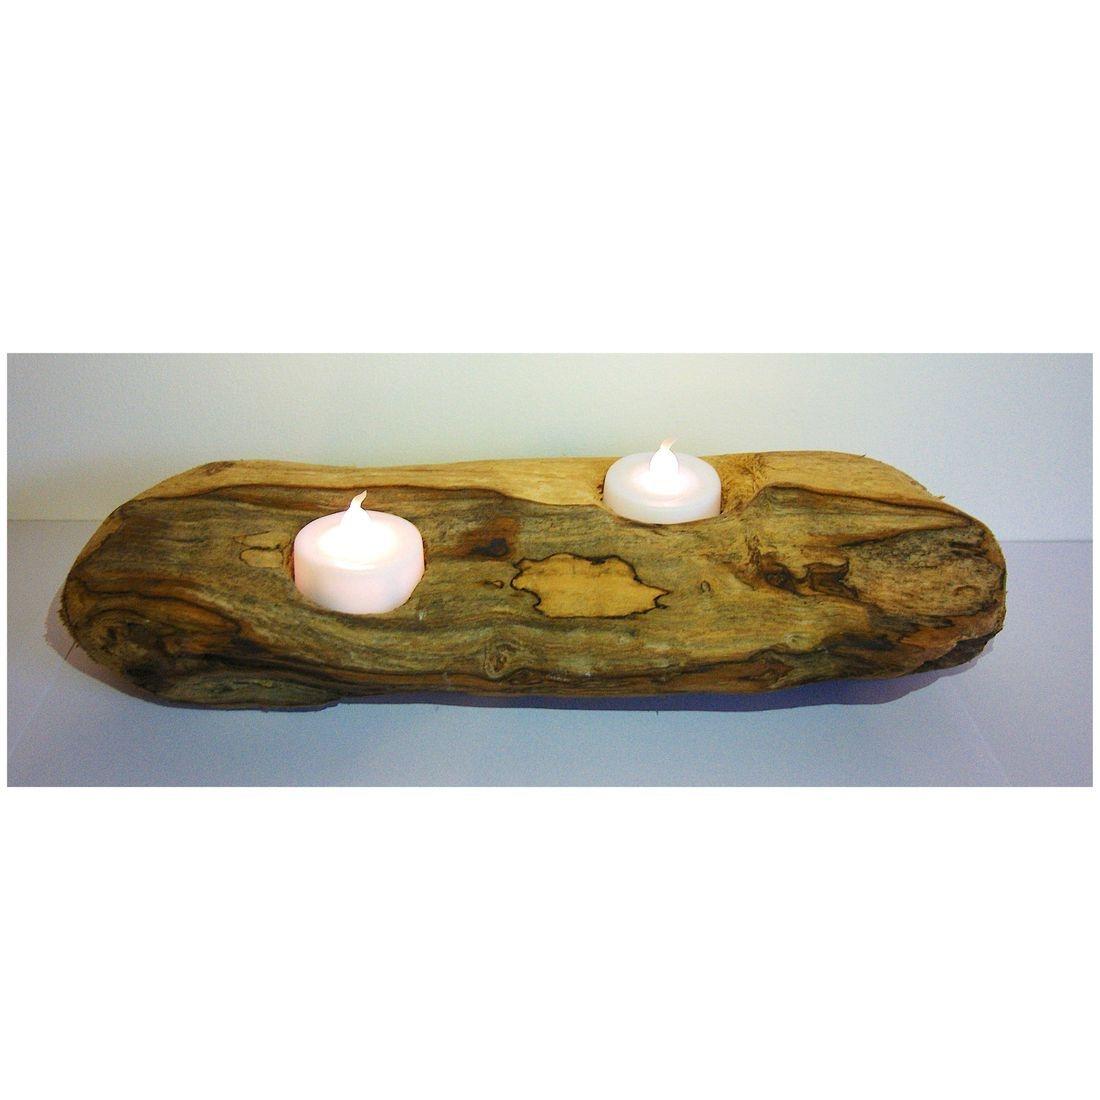 Driftwood log candle tea light holder 6